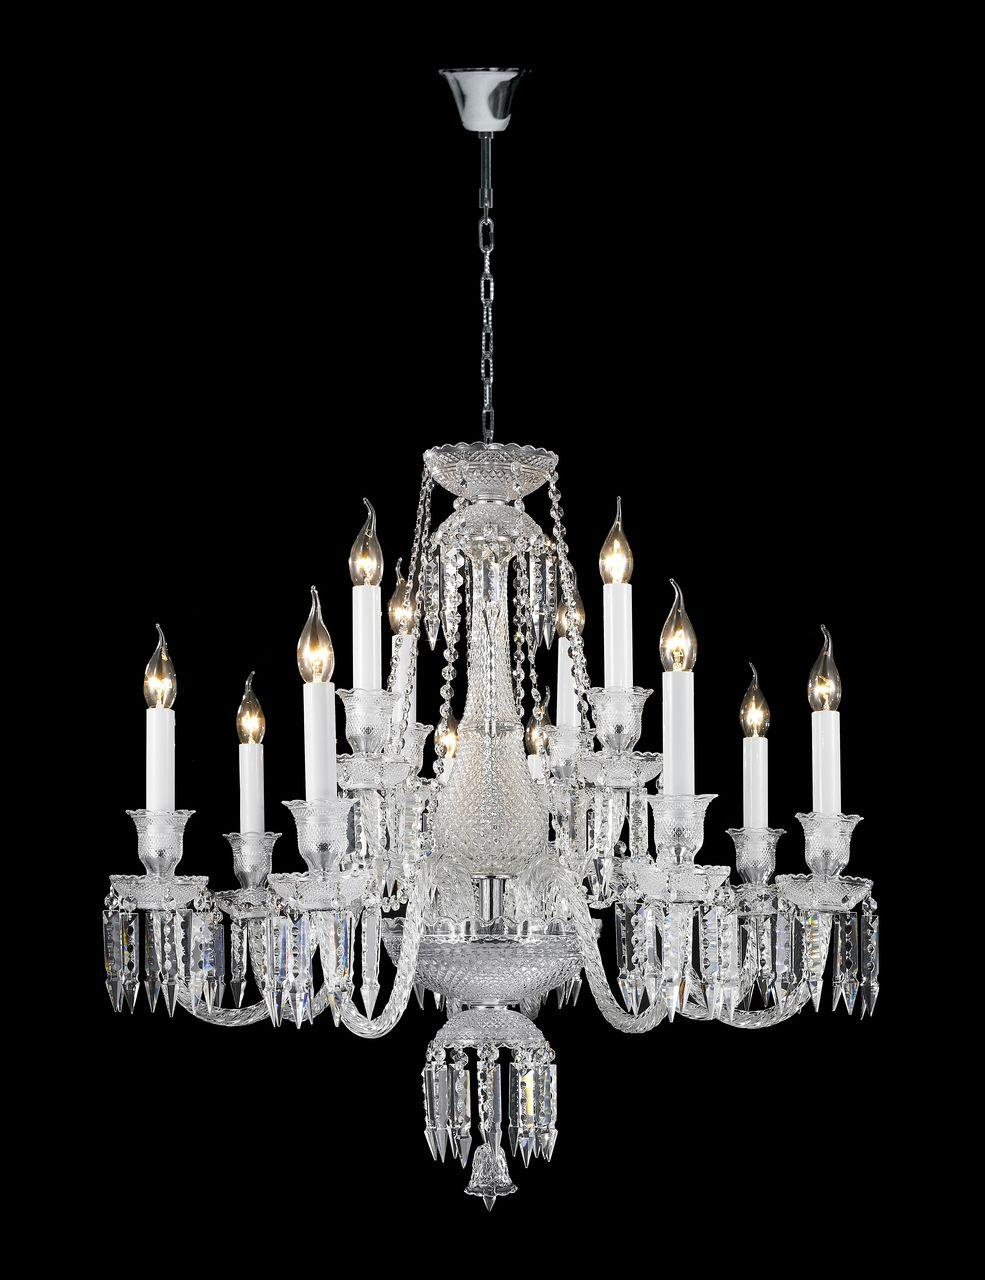 Buckingham Chandelier 12 Arm Chandelier Chandelier Design Ceiling Lights